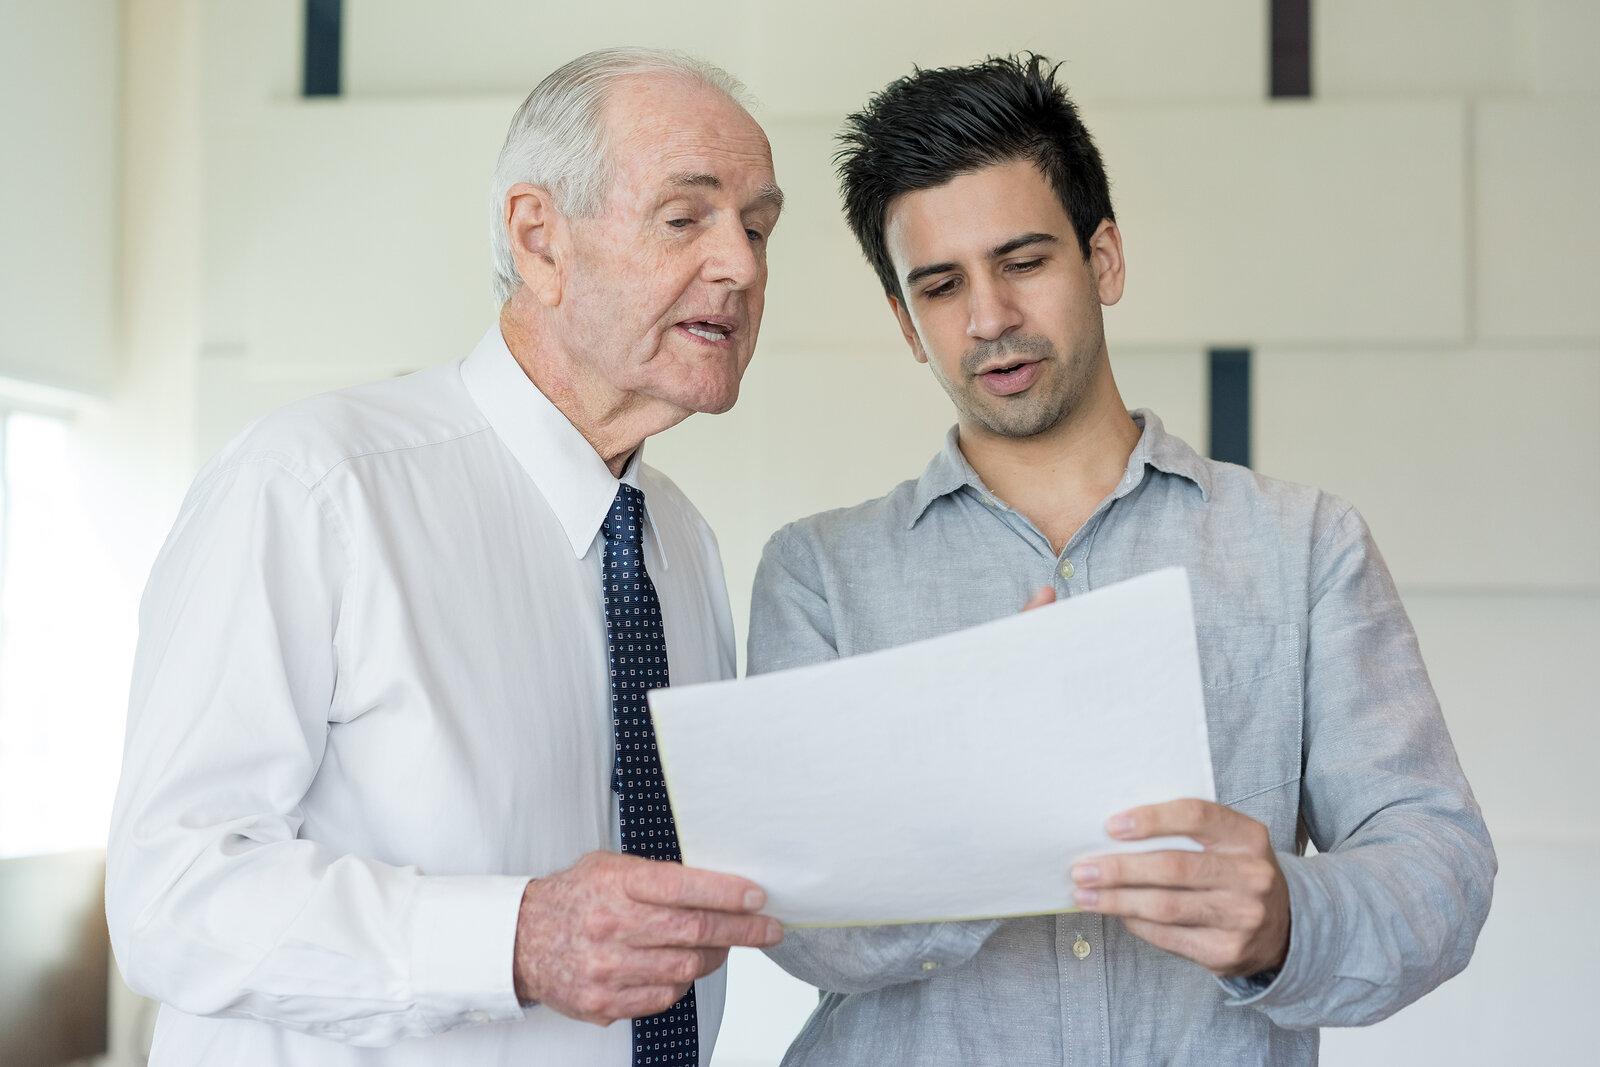 A senior leader mentoring an employee.